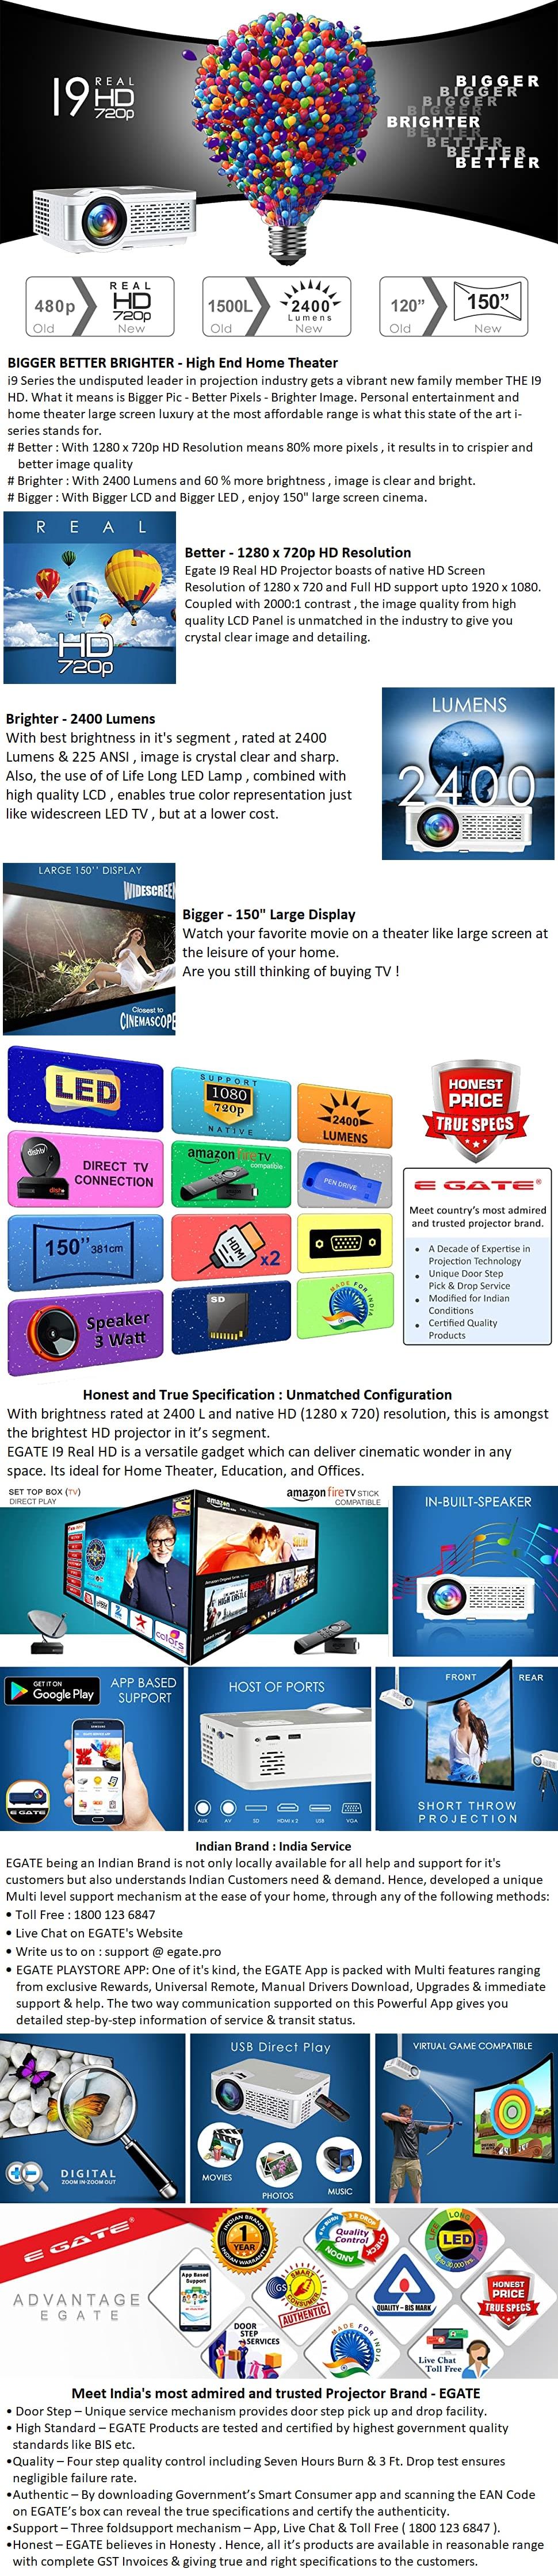 https://assetscdn1.paytm.com/images/catalog/product/G/GA/GAMEGATE-I9-HD-DUMM20256843D54C1/12.png